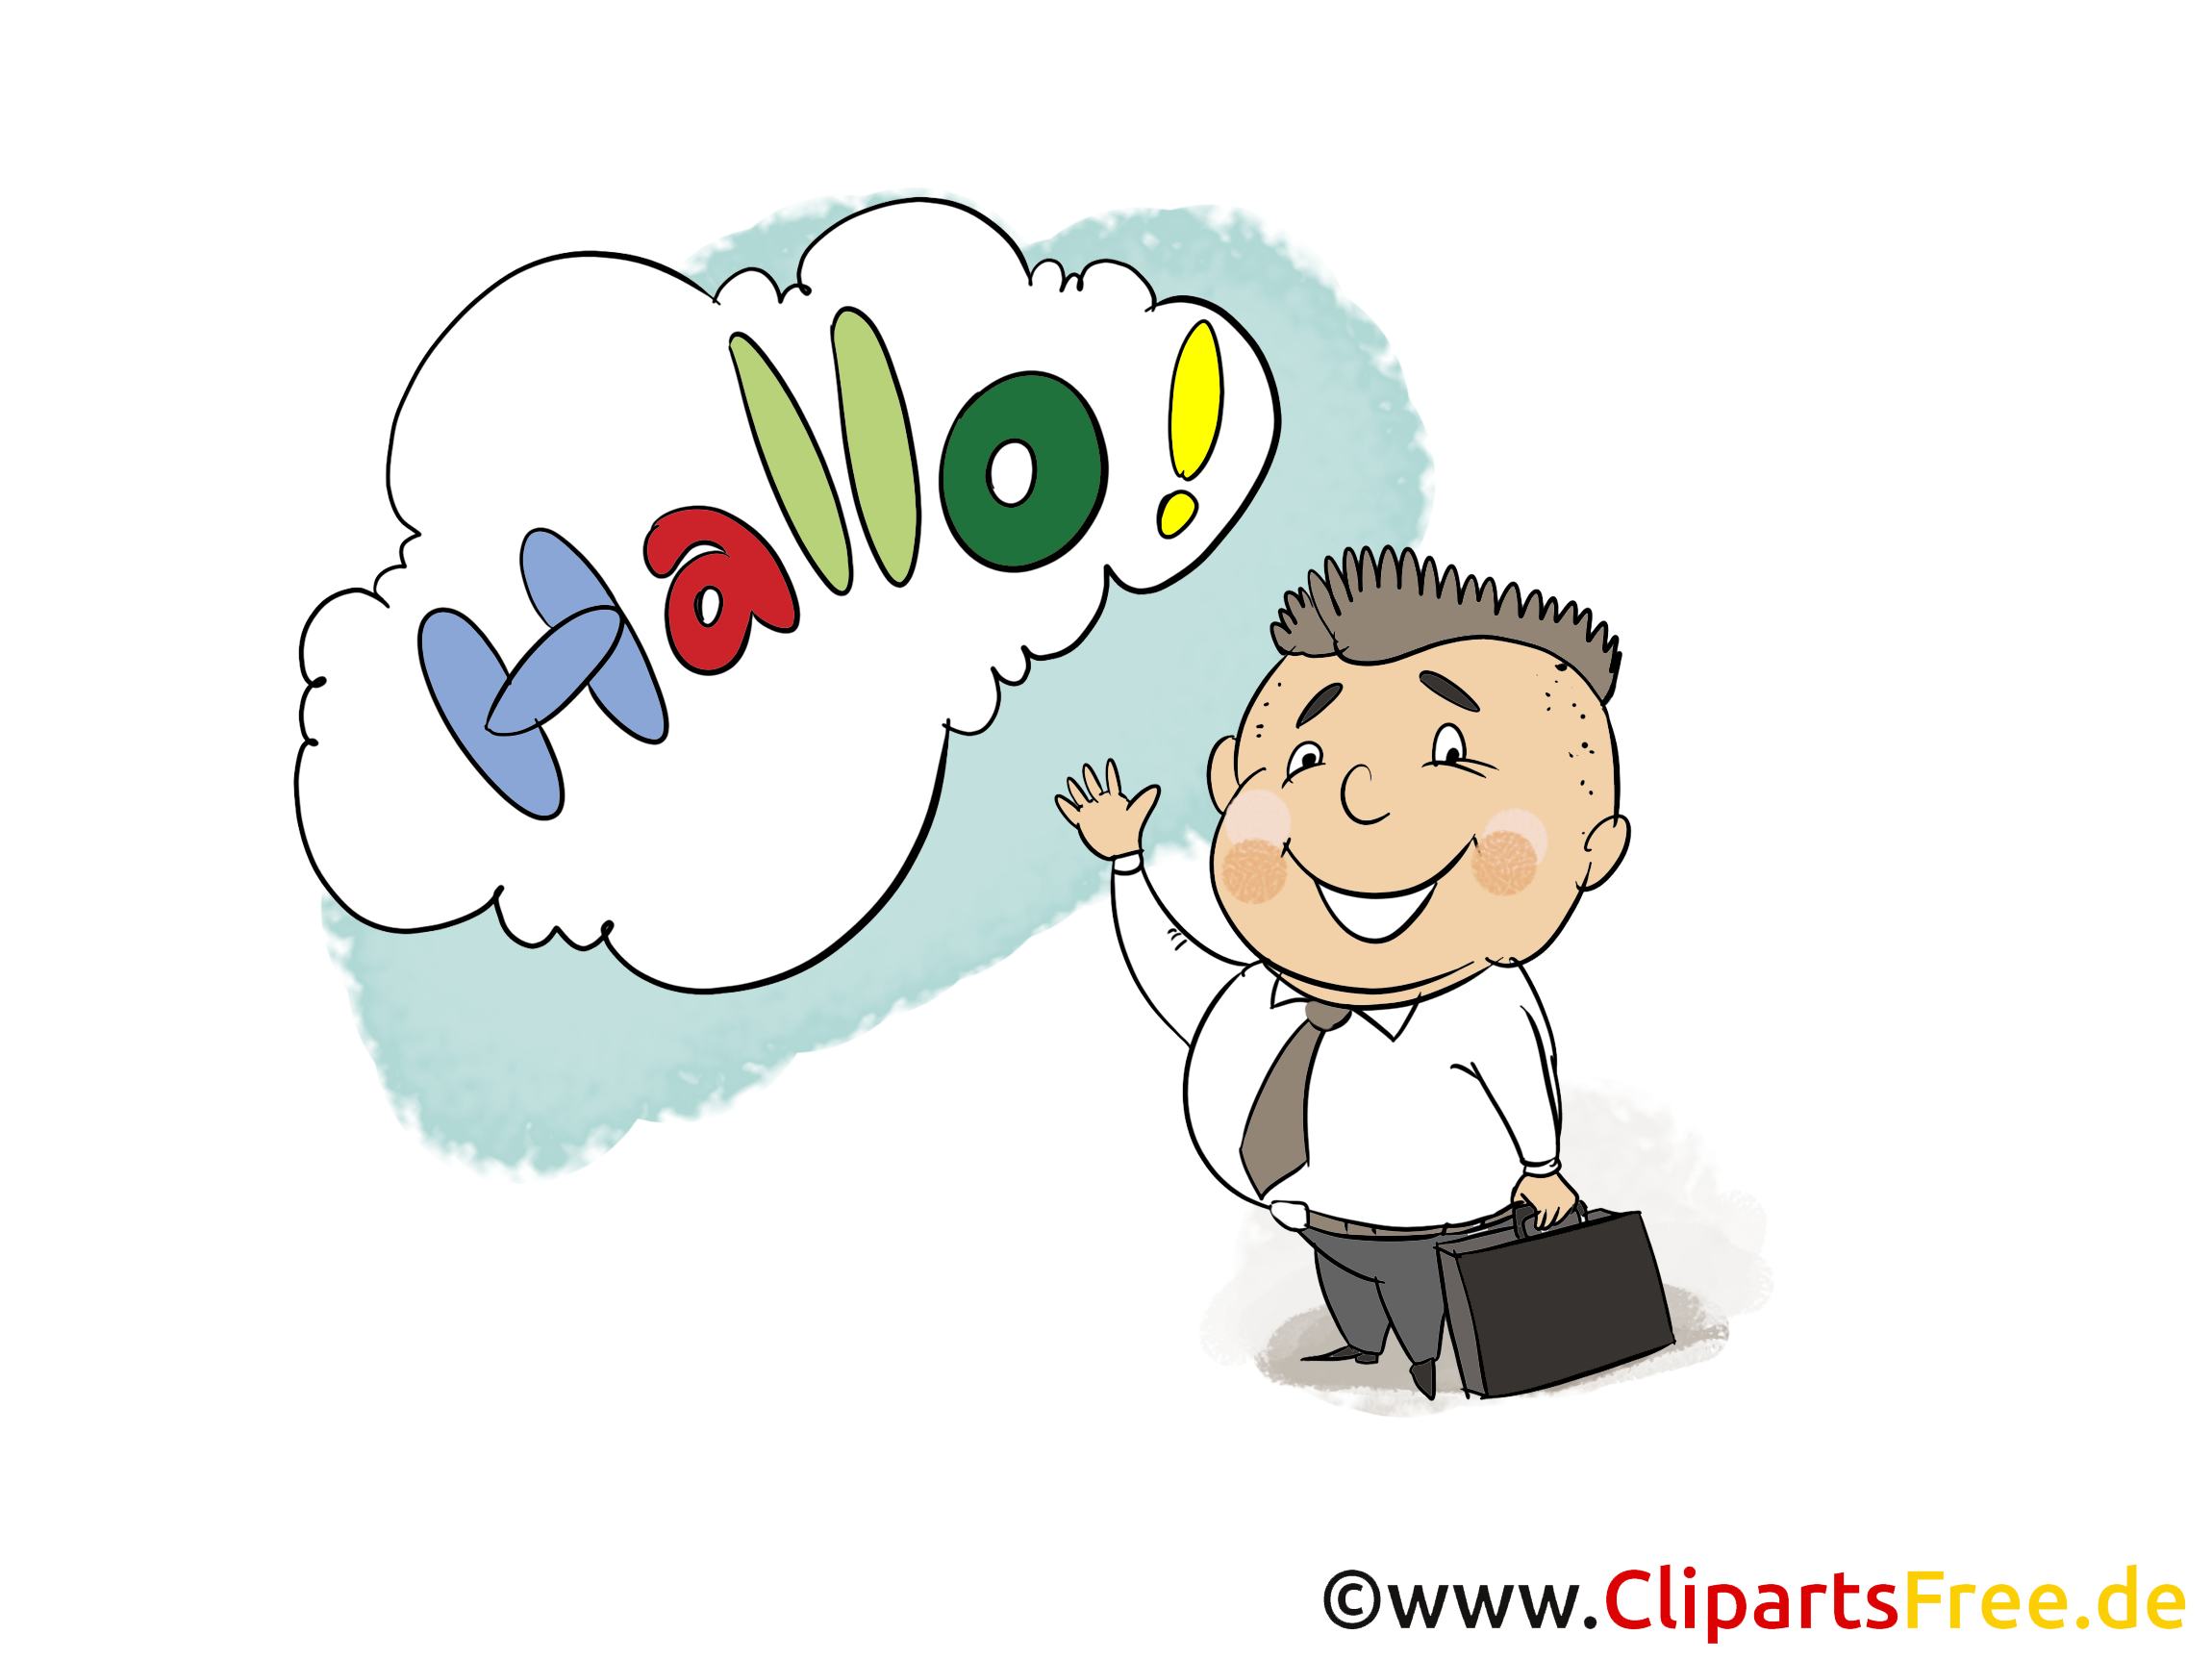 Hallo Clip Art, Bild, Grafik, Karte, Cartoon